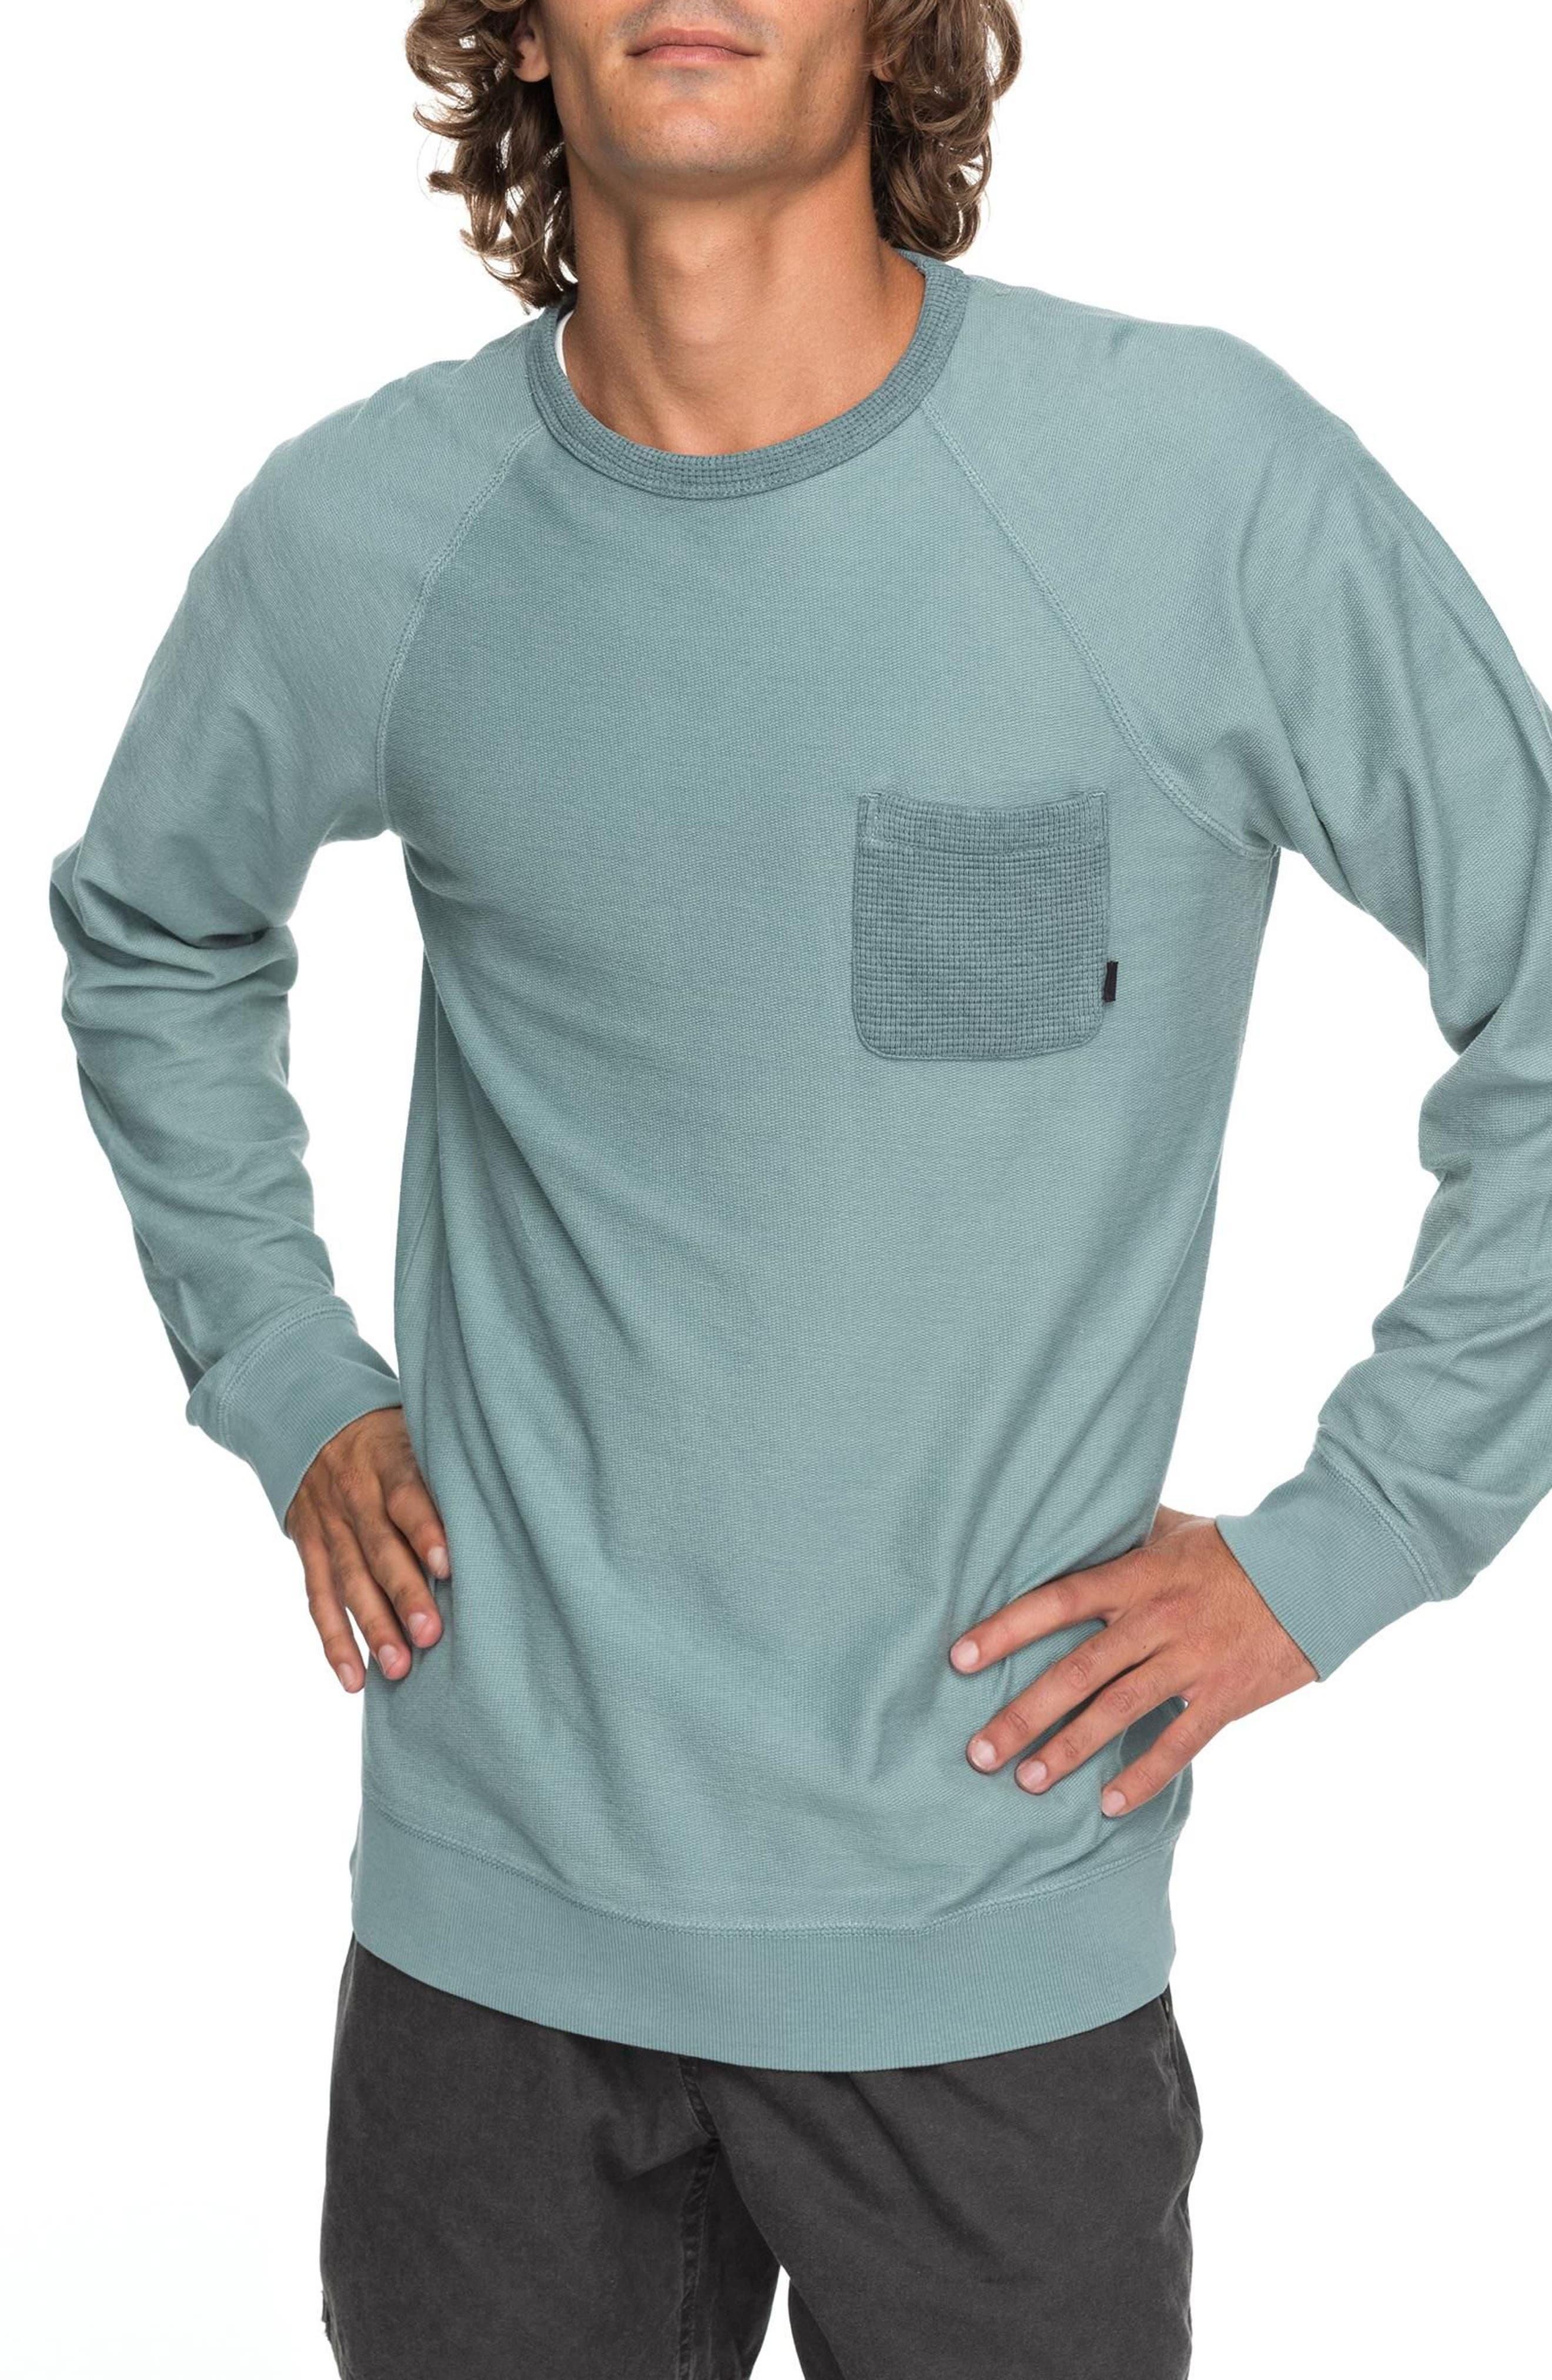 Baao Sweatshirt,                         Main,                         color, Trellis